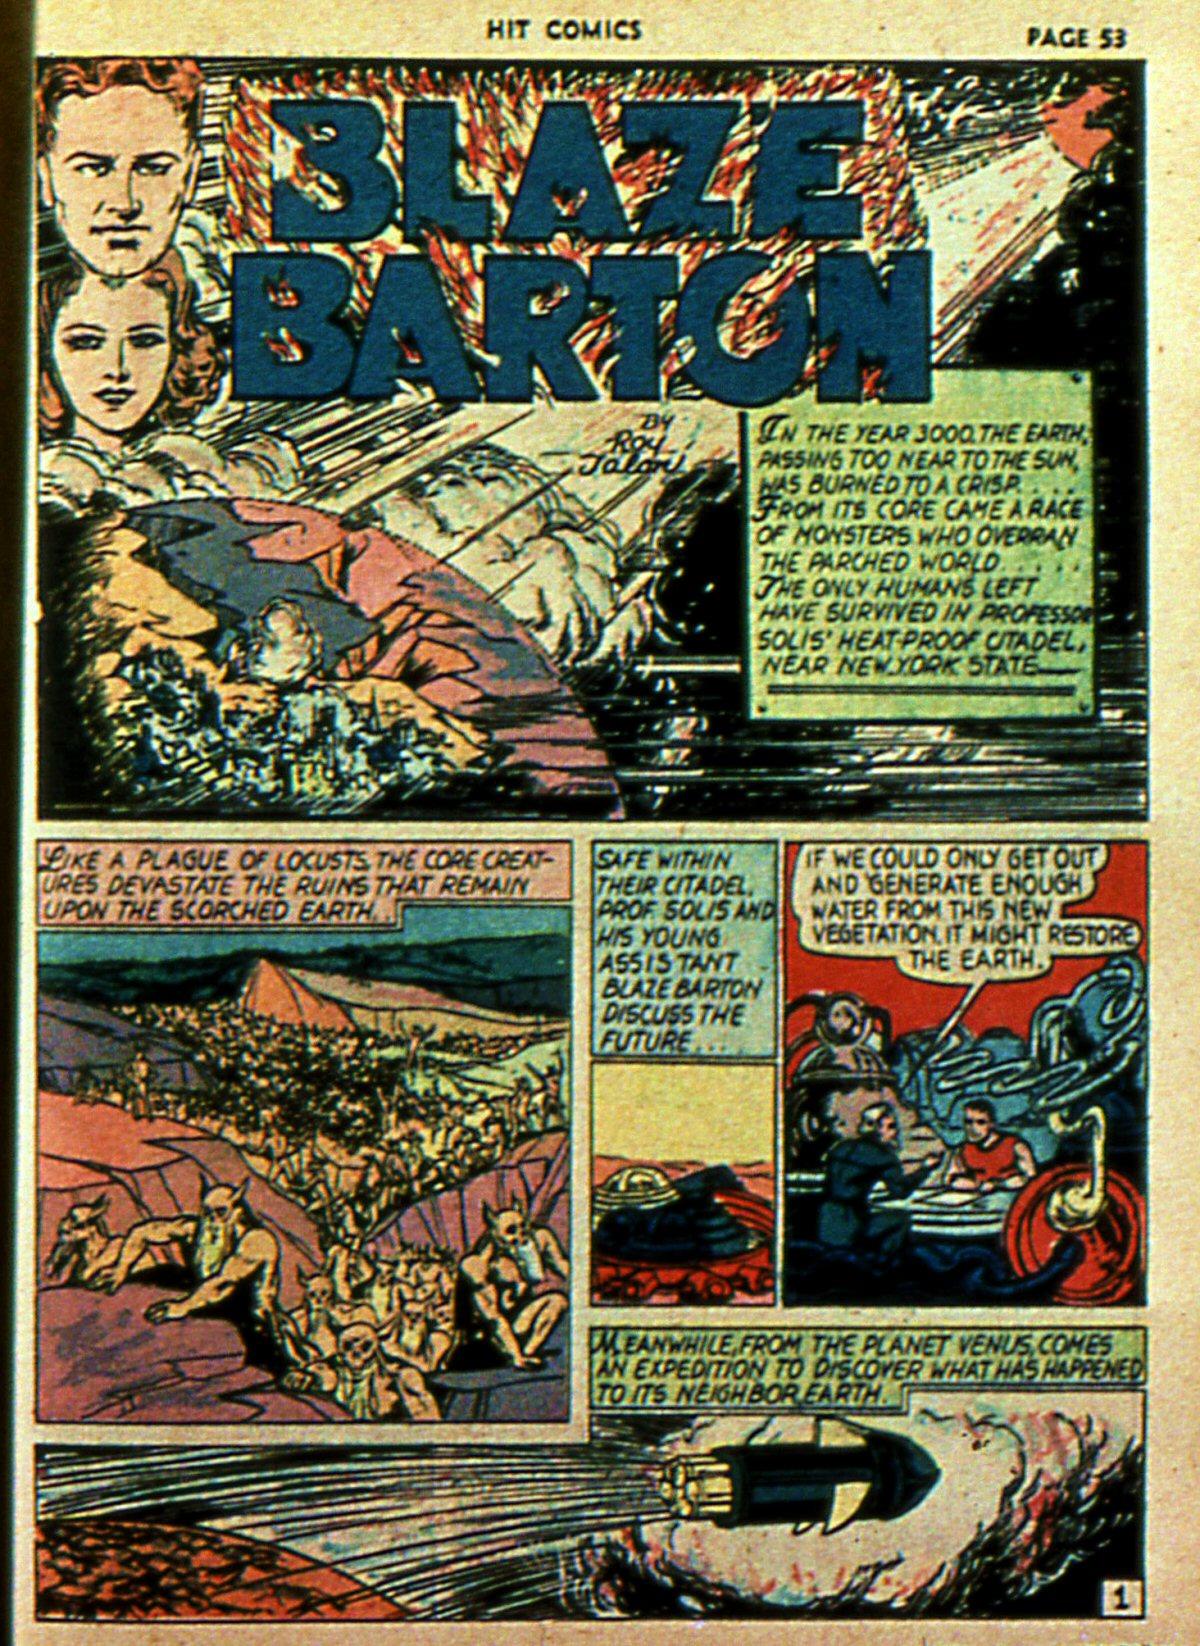 Read online Hit Comics comic -  Issue #2 - 55